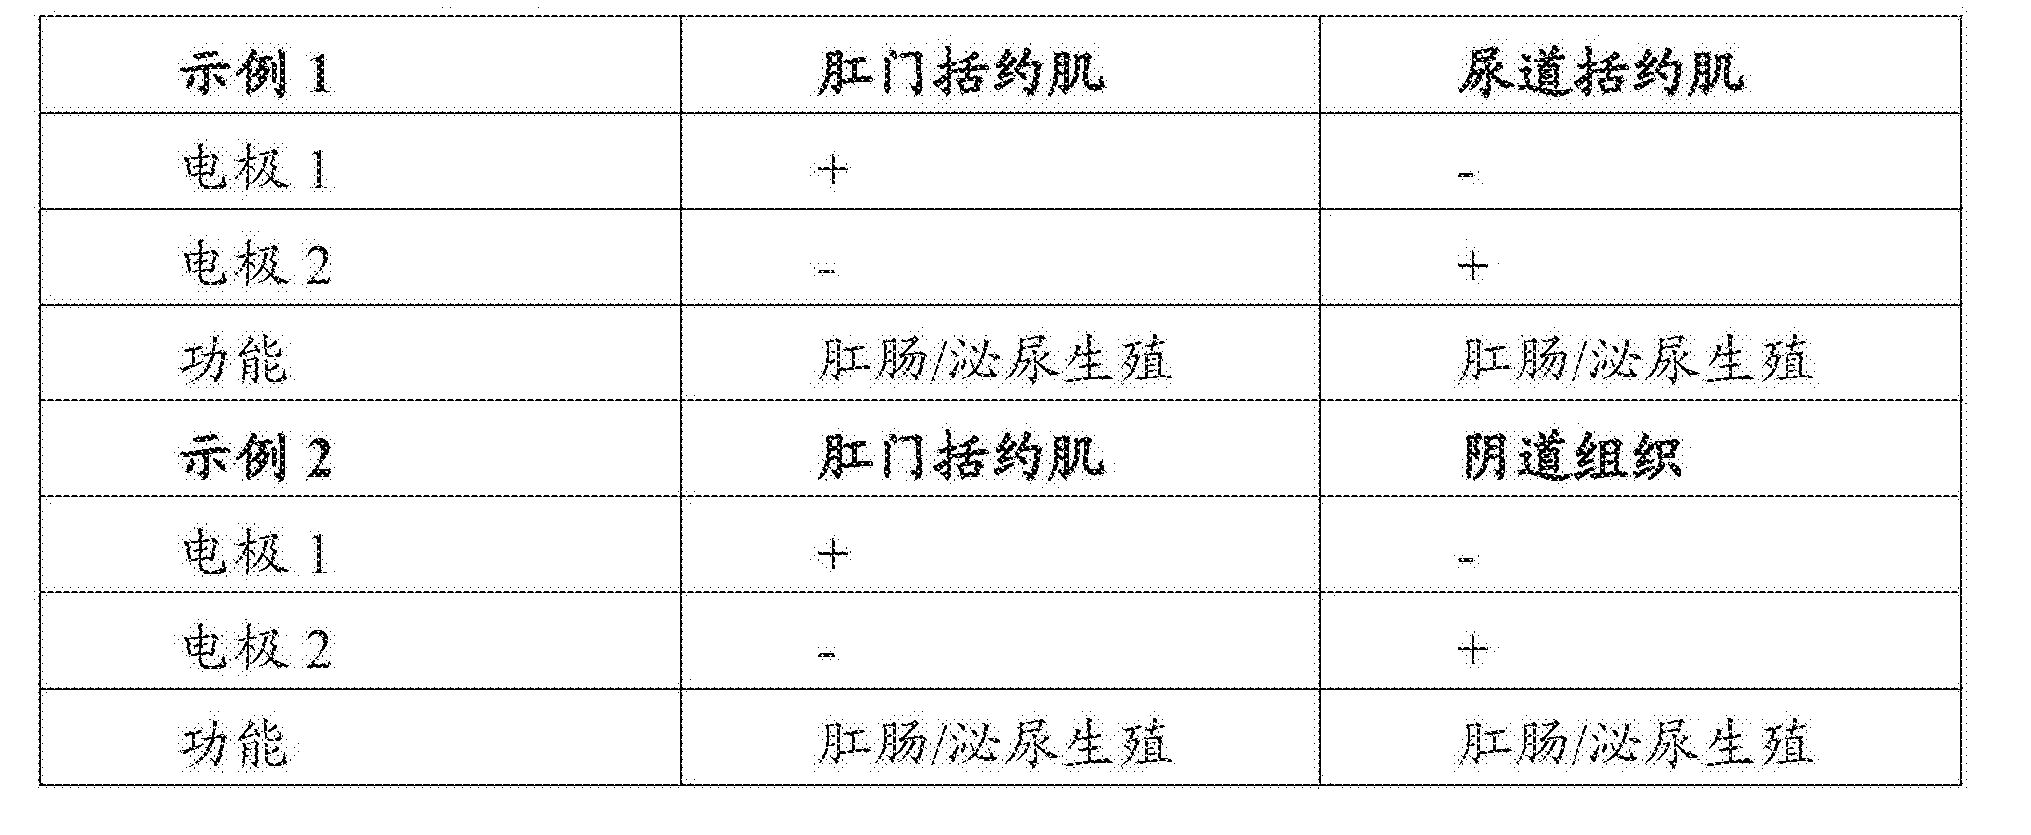 Figure CN107847336AD00331